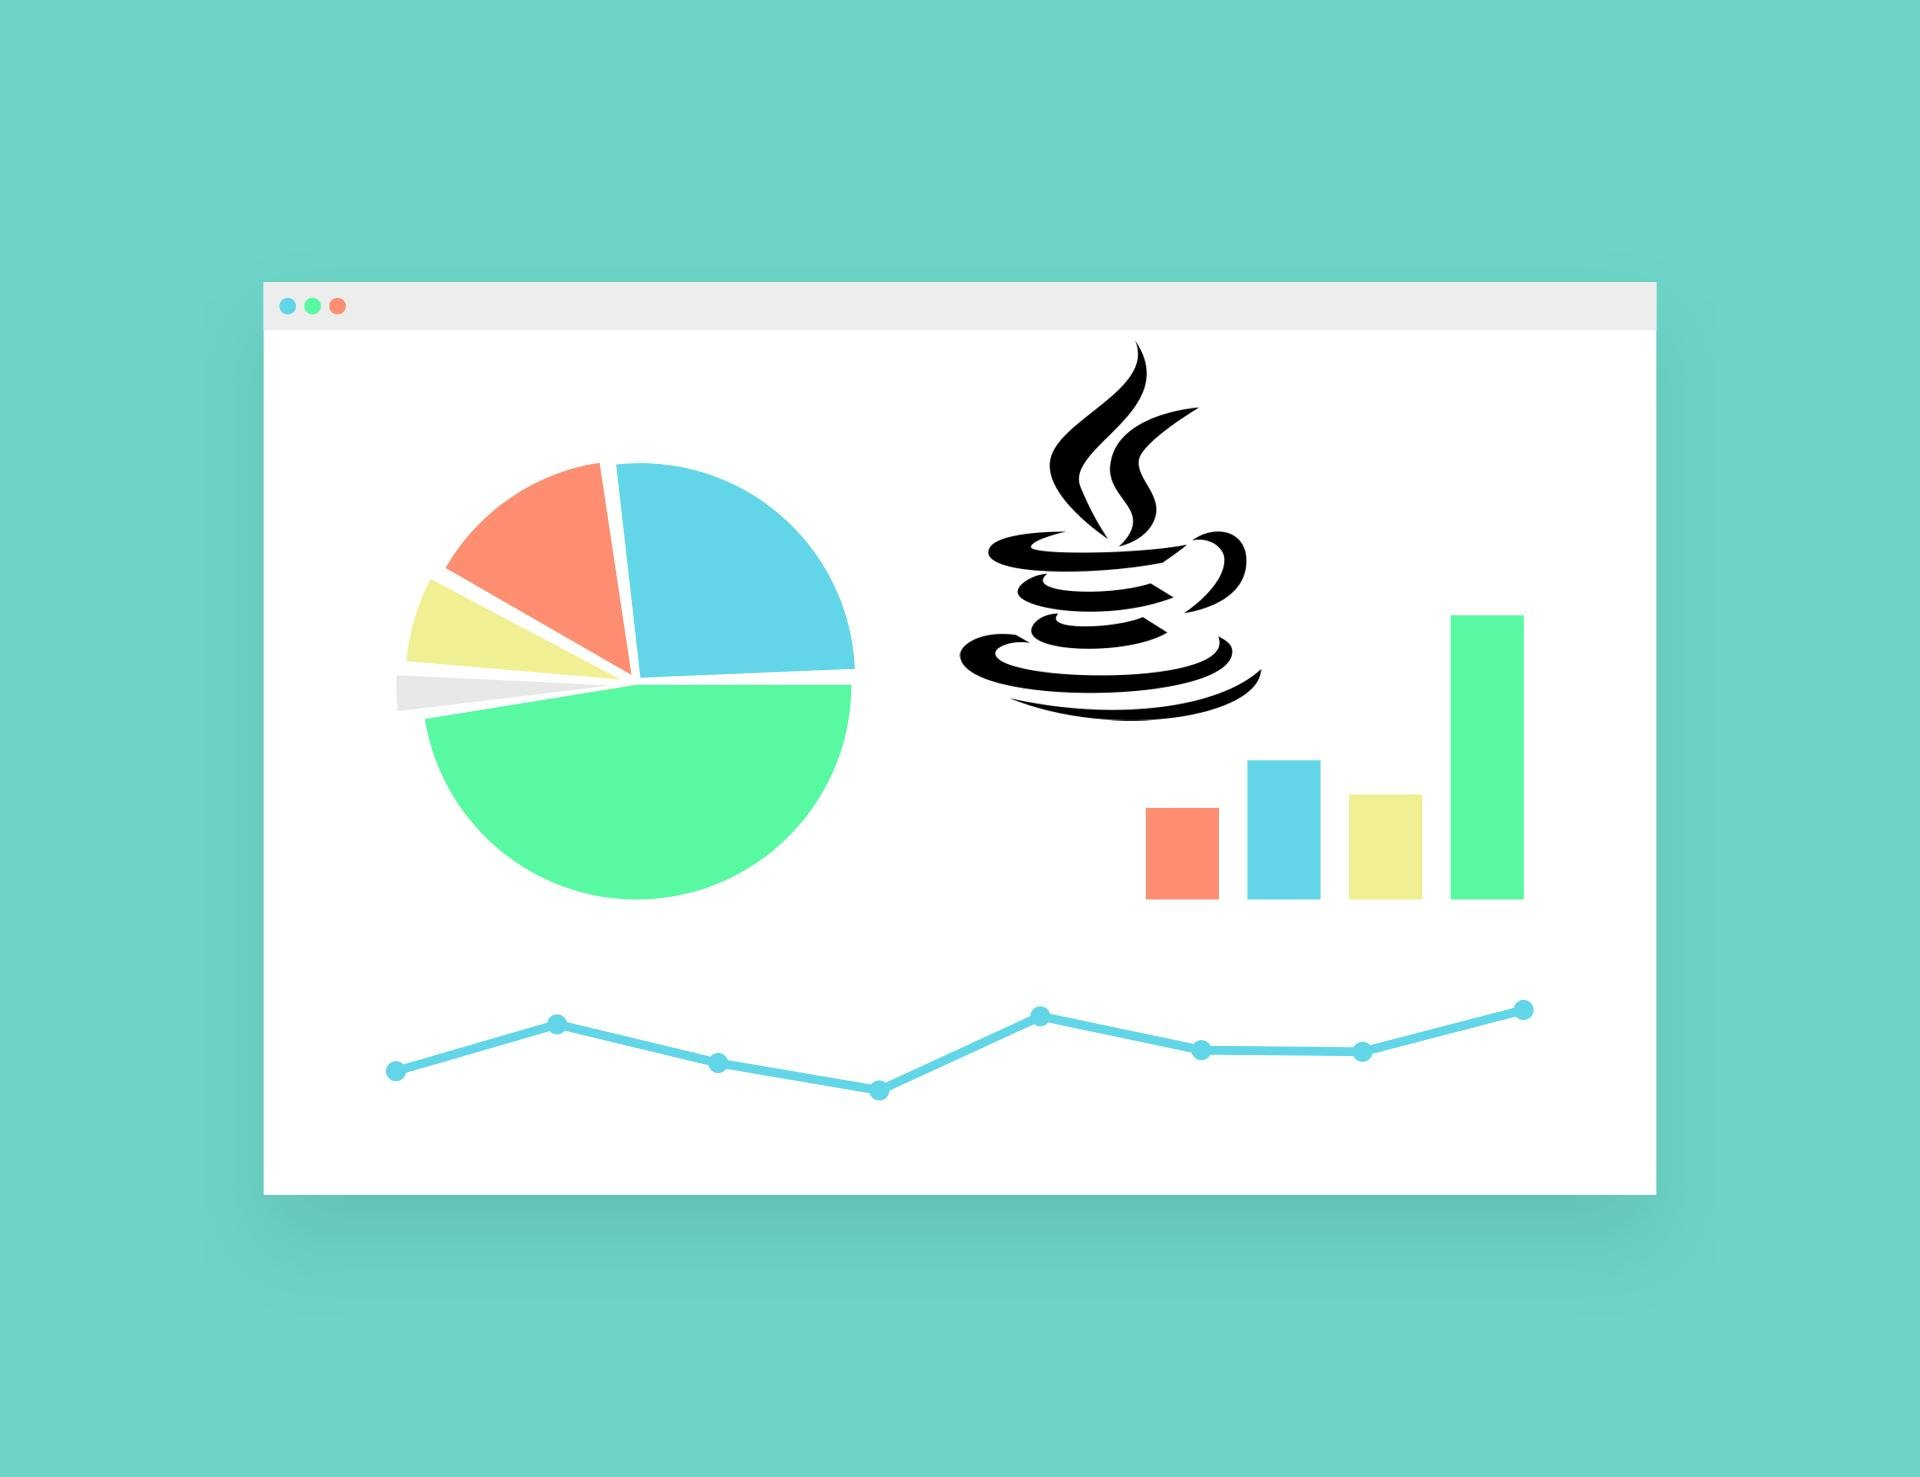 Обзор Java библиотеки standard widget toolkit для GUI